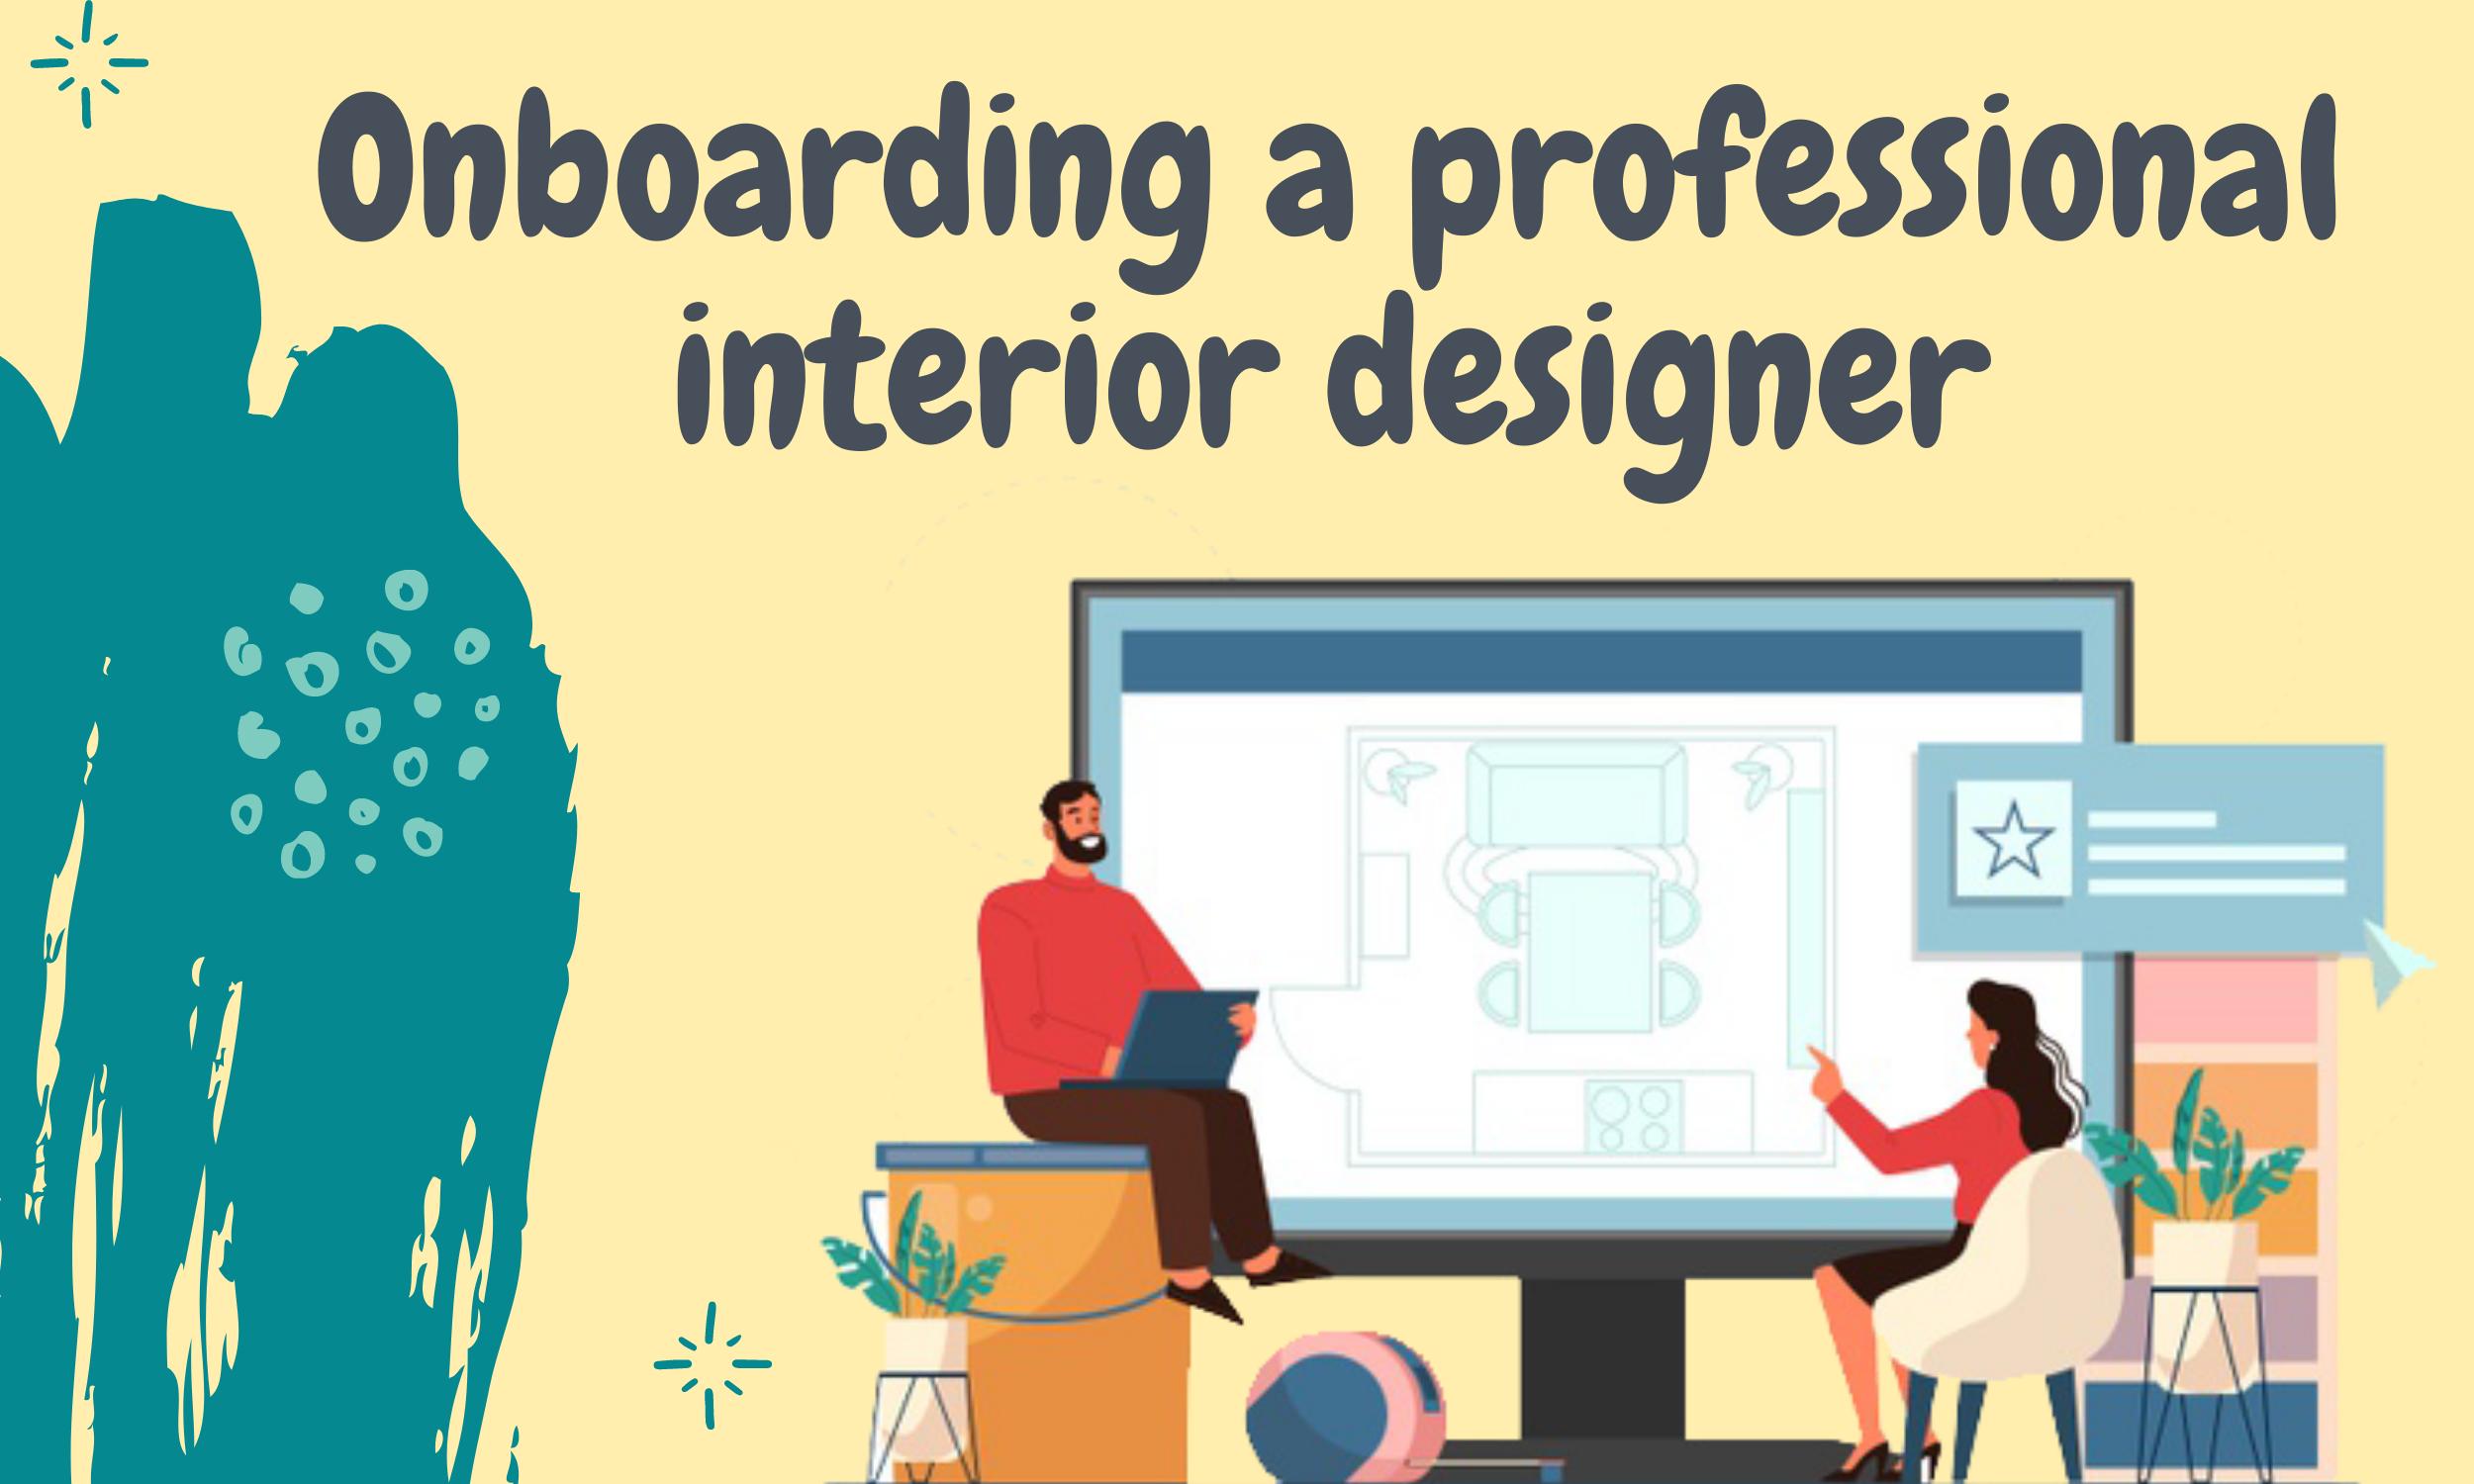 Onboarding-a-professional-interior-designer